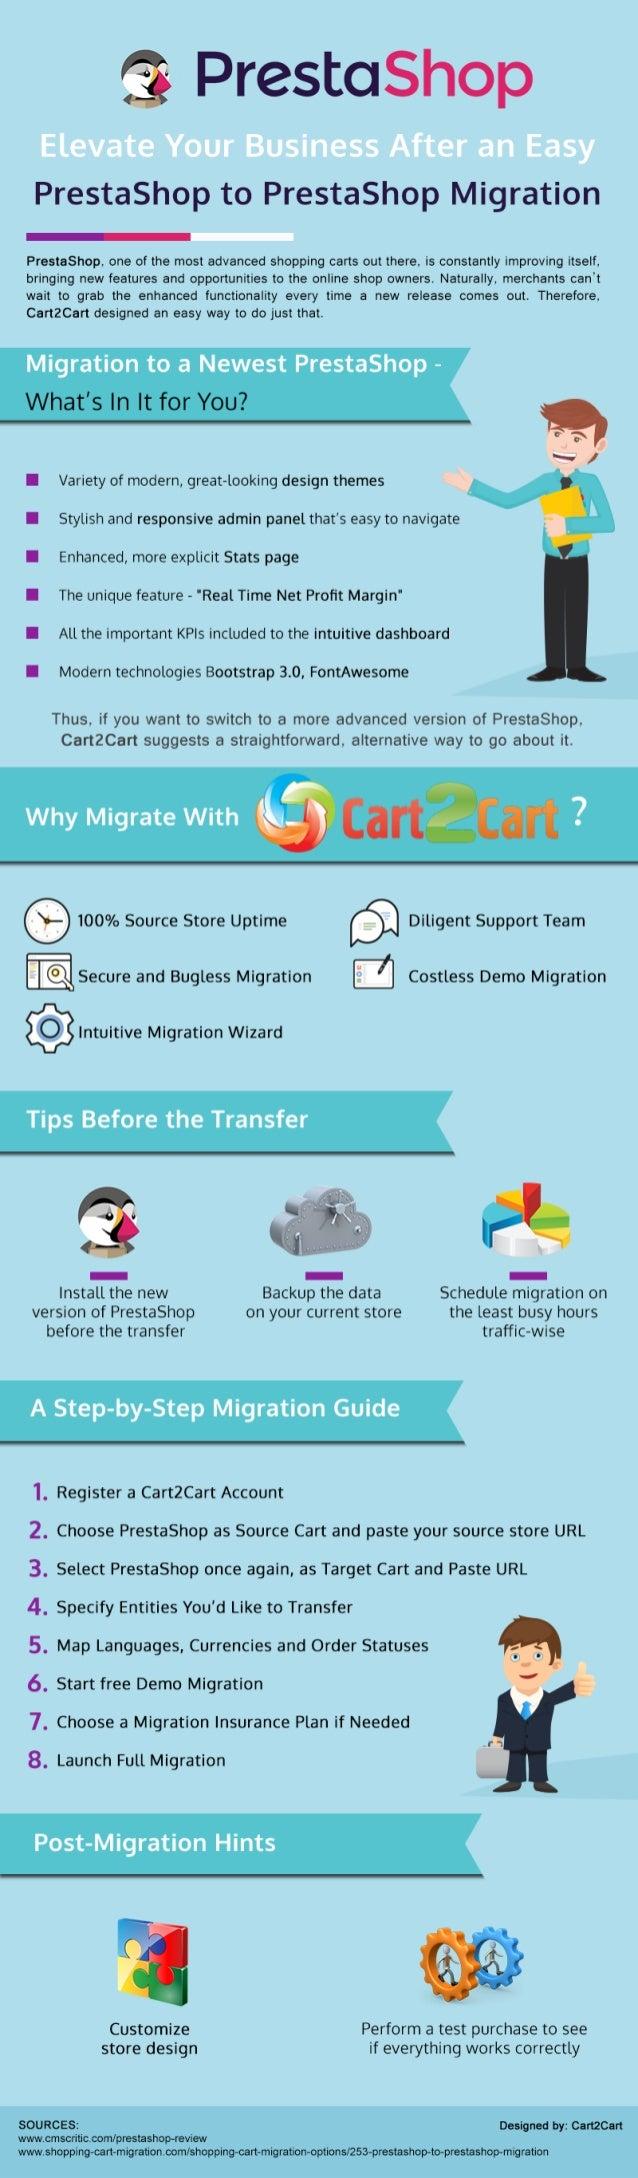 PrestaShop to PrestaShop Migration